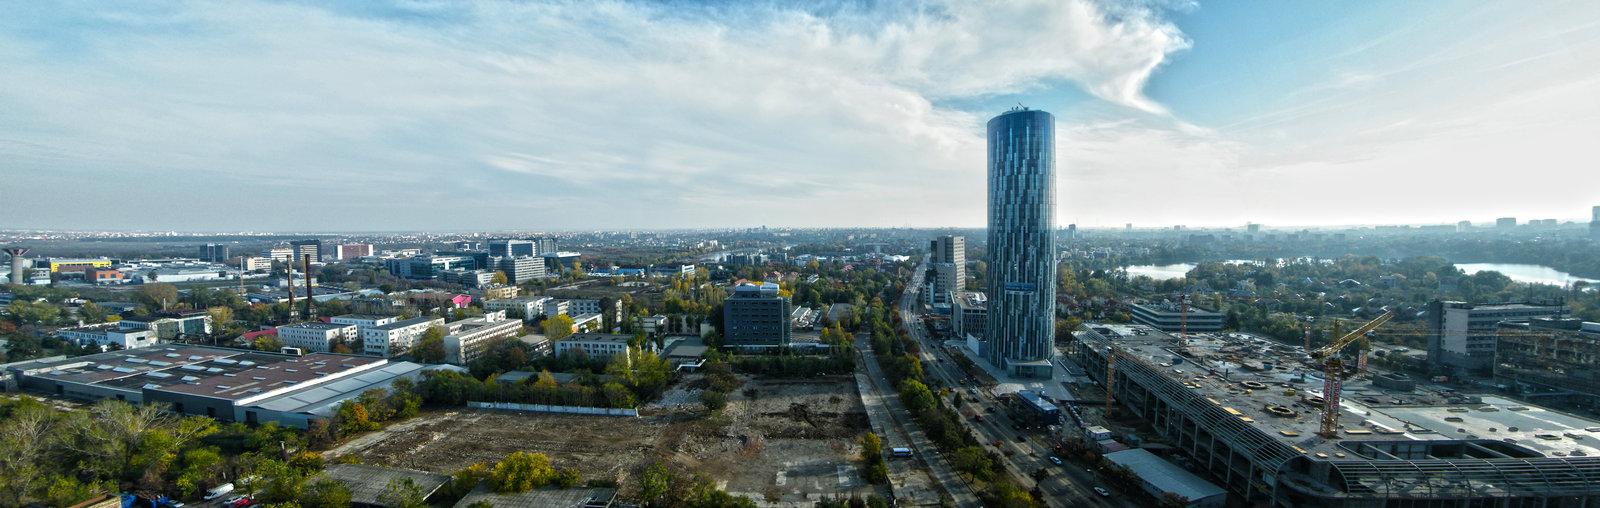 Bucarest, capitale de la Roumanie